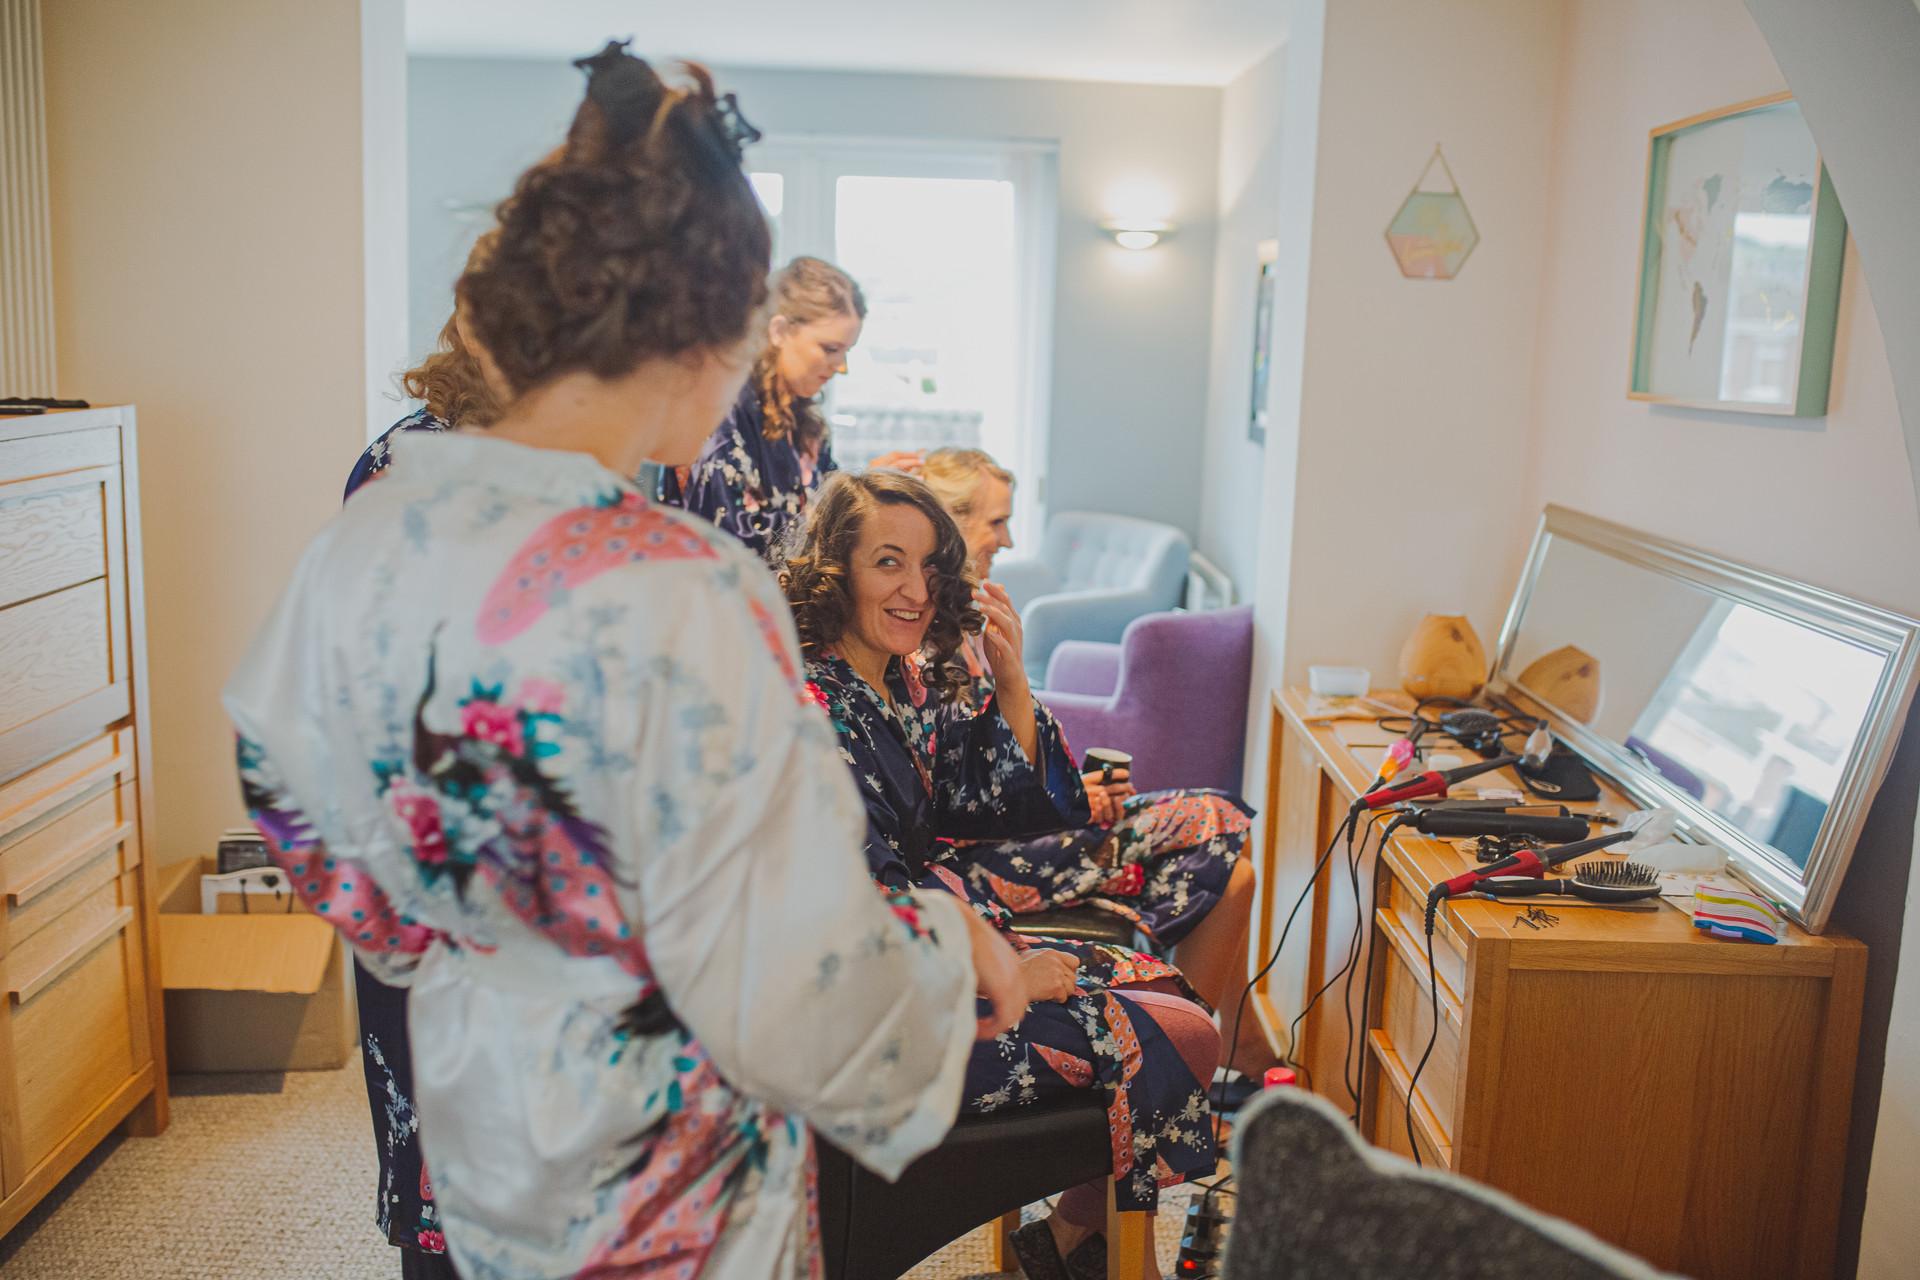 Wedding Morning Prep Photos | Boho Bride | Quirky Wedding | Living Witness Weddings